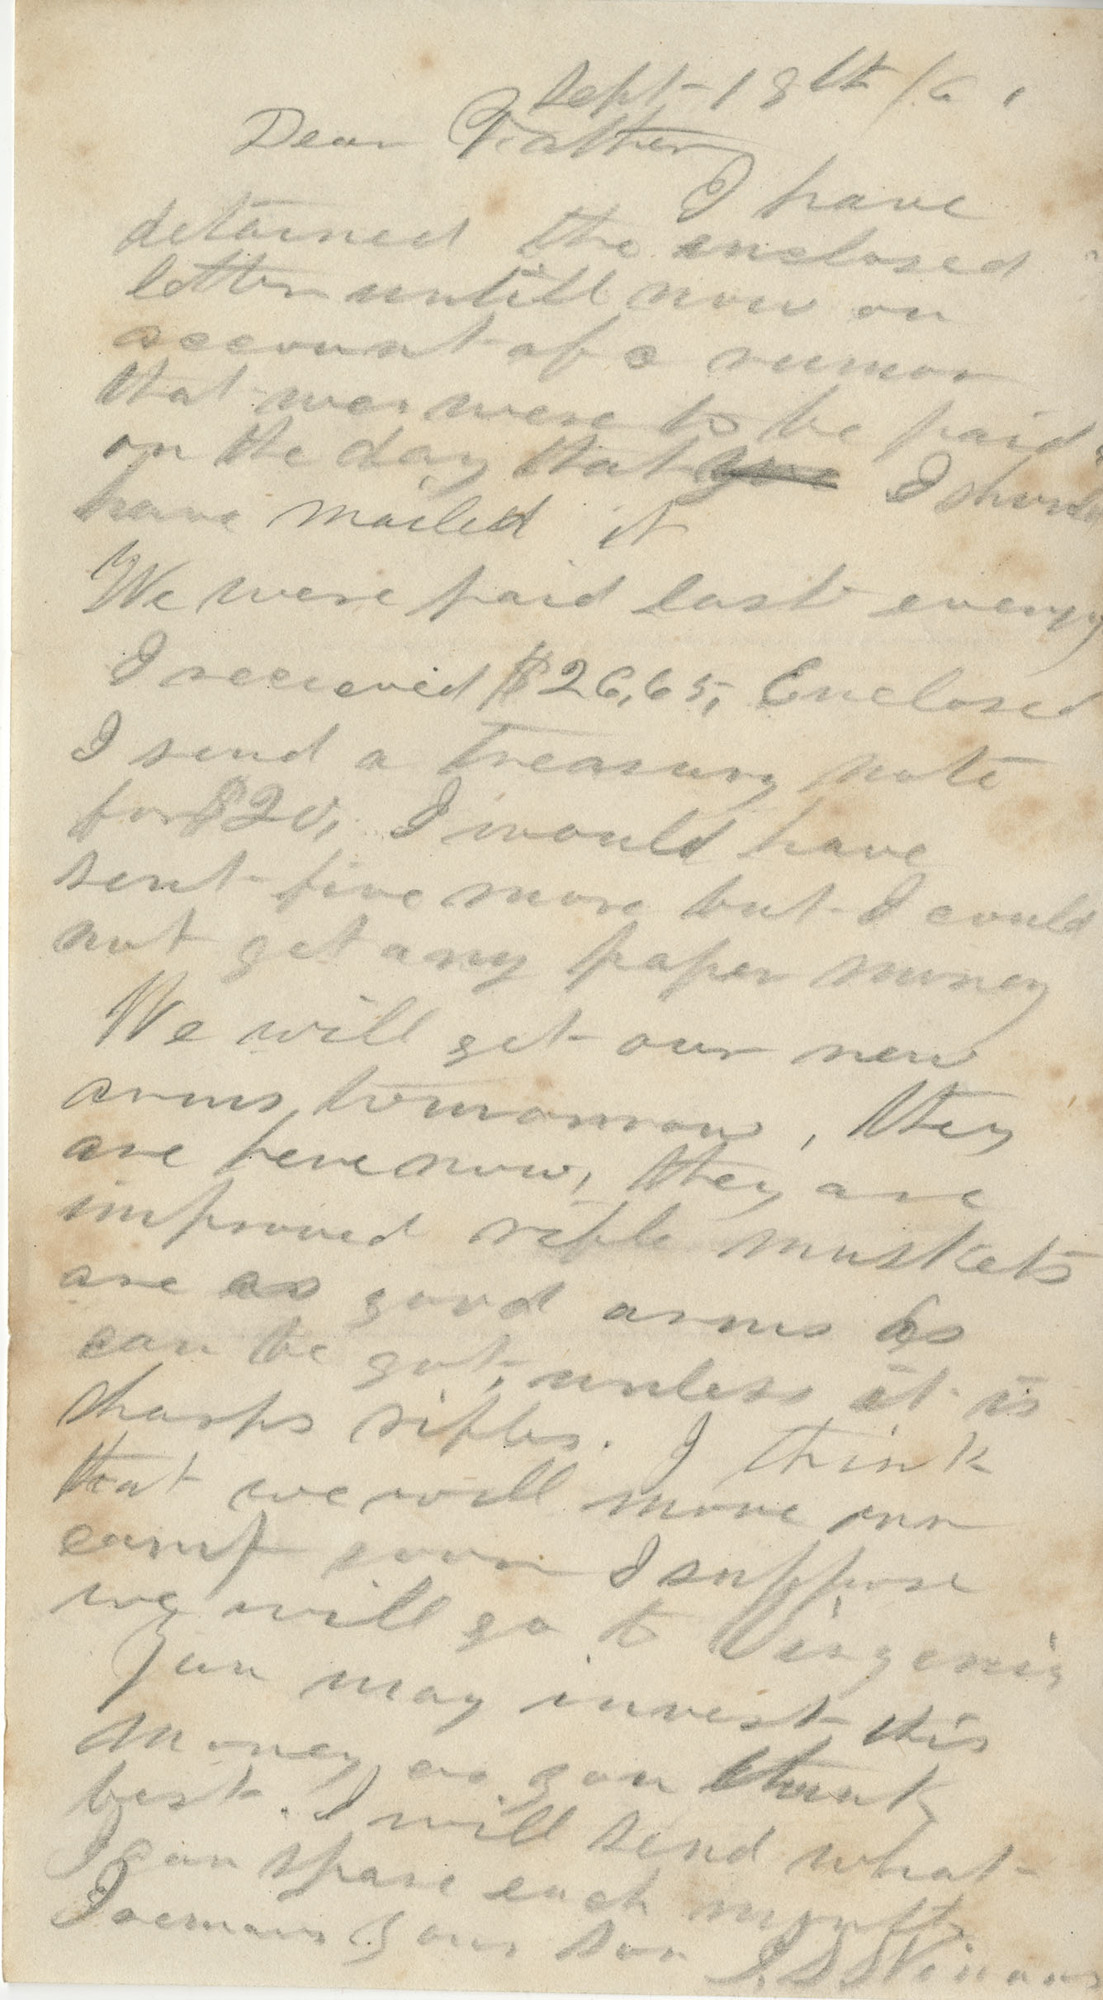 Ms2015-062_WinansJacob_Correspondence_1861_0918.jpg